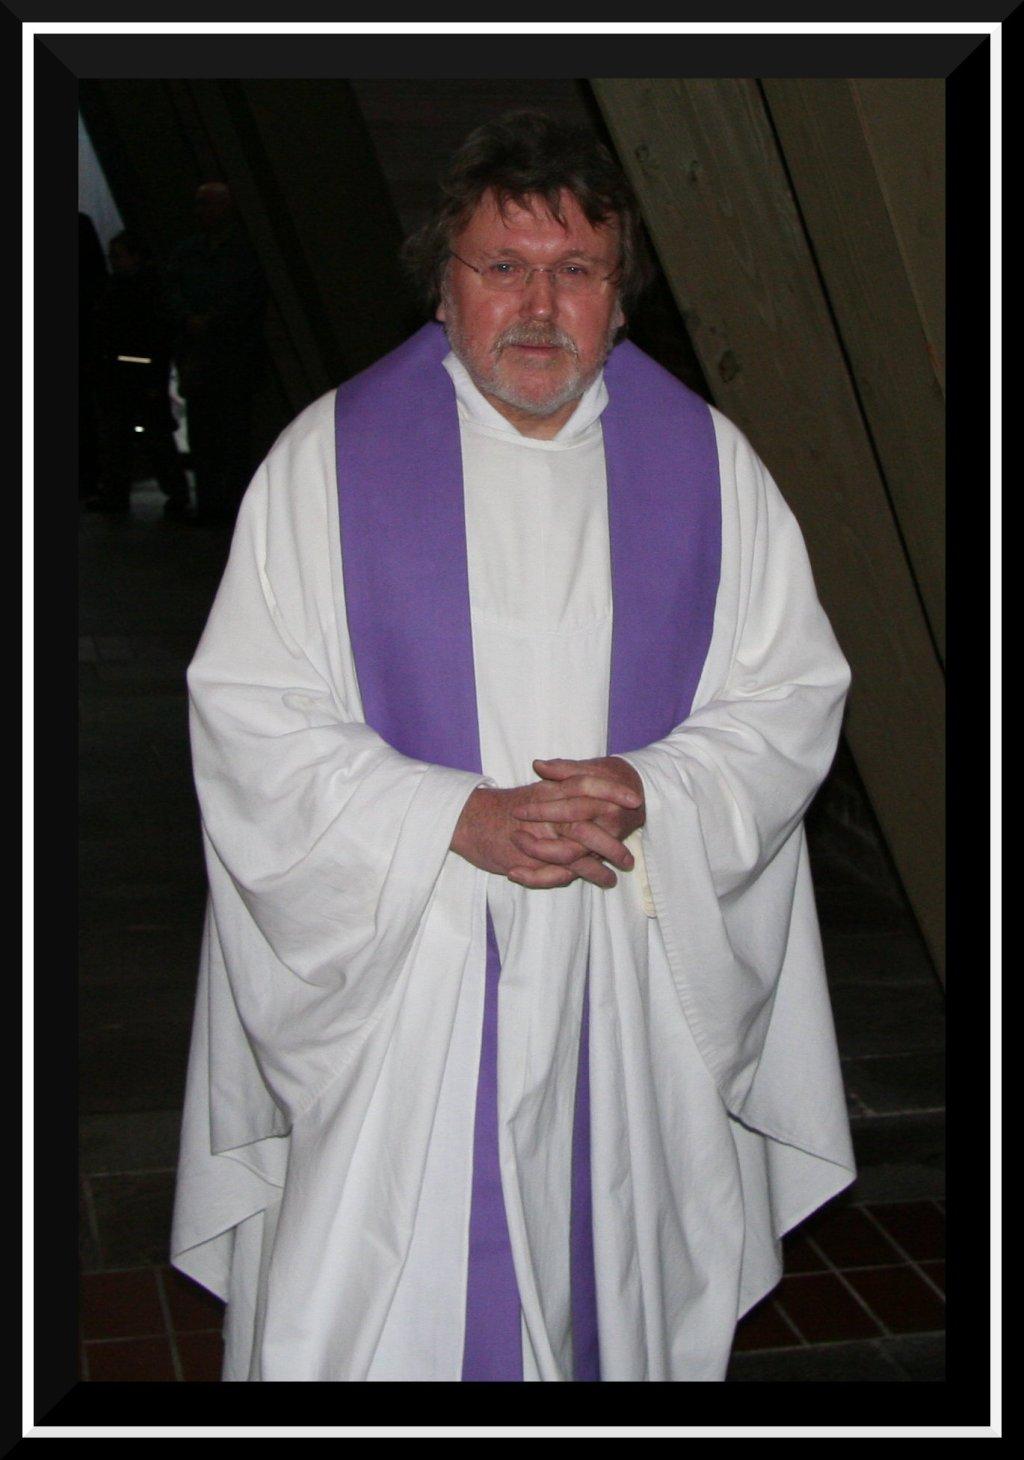 Pfarrer Hans-Otto Bussalb